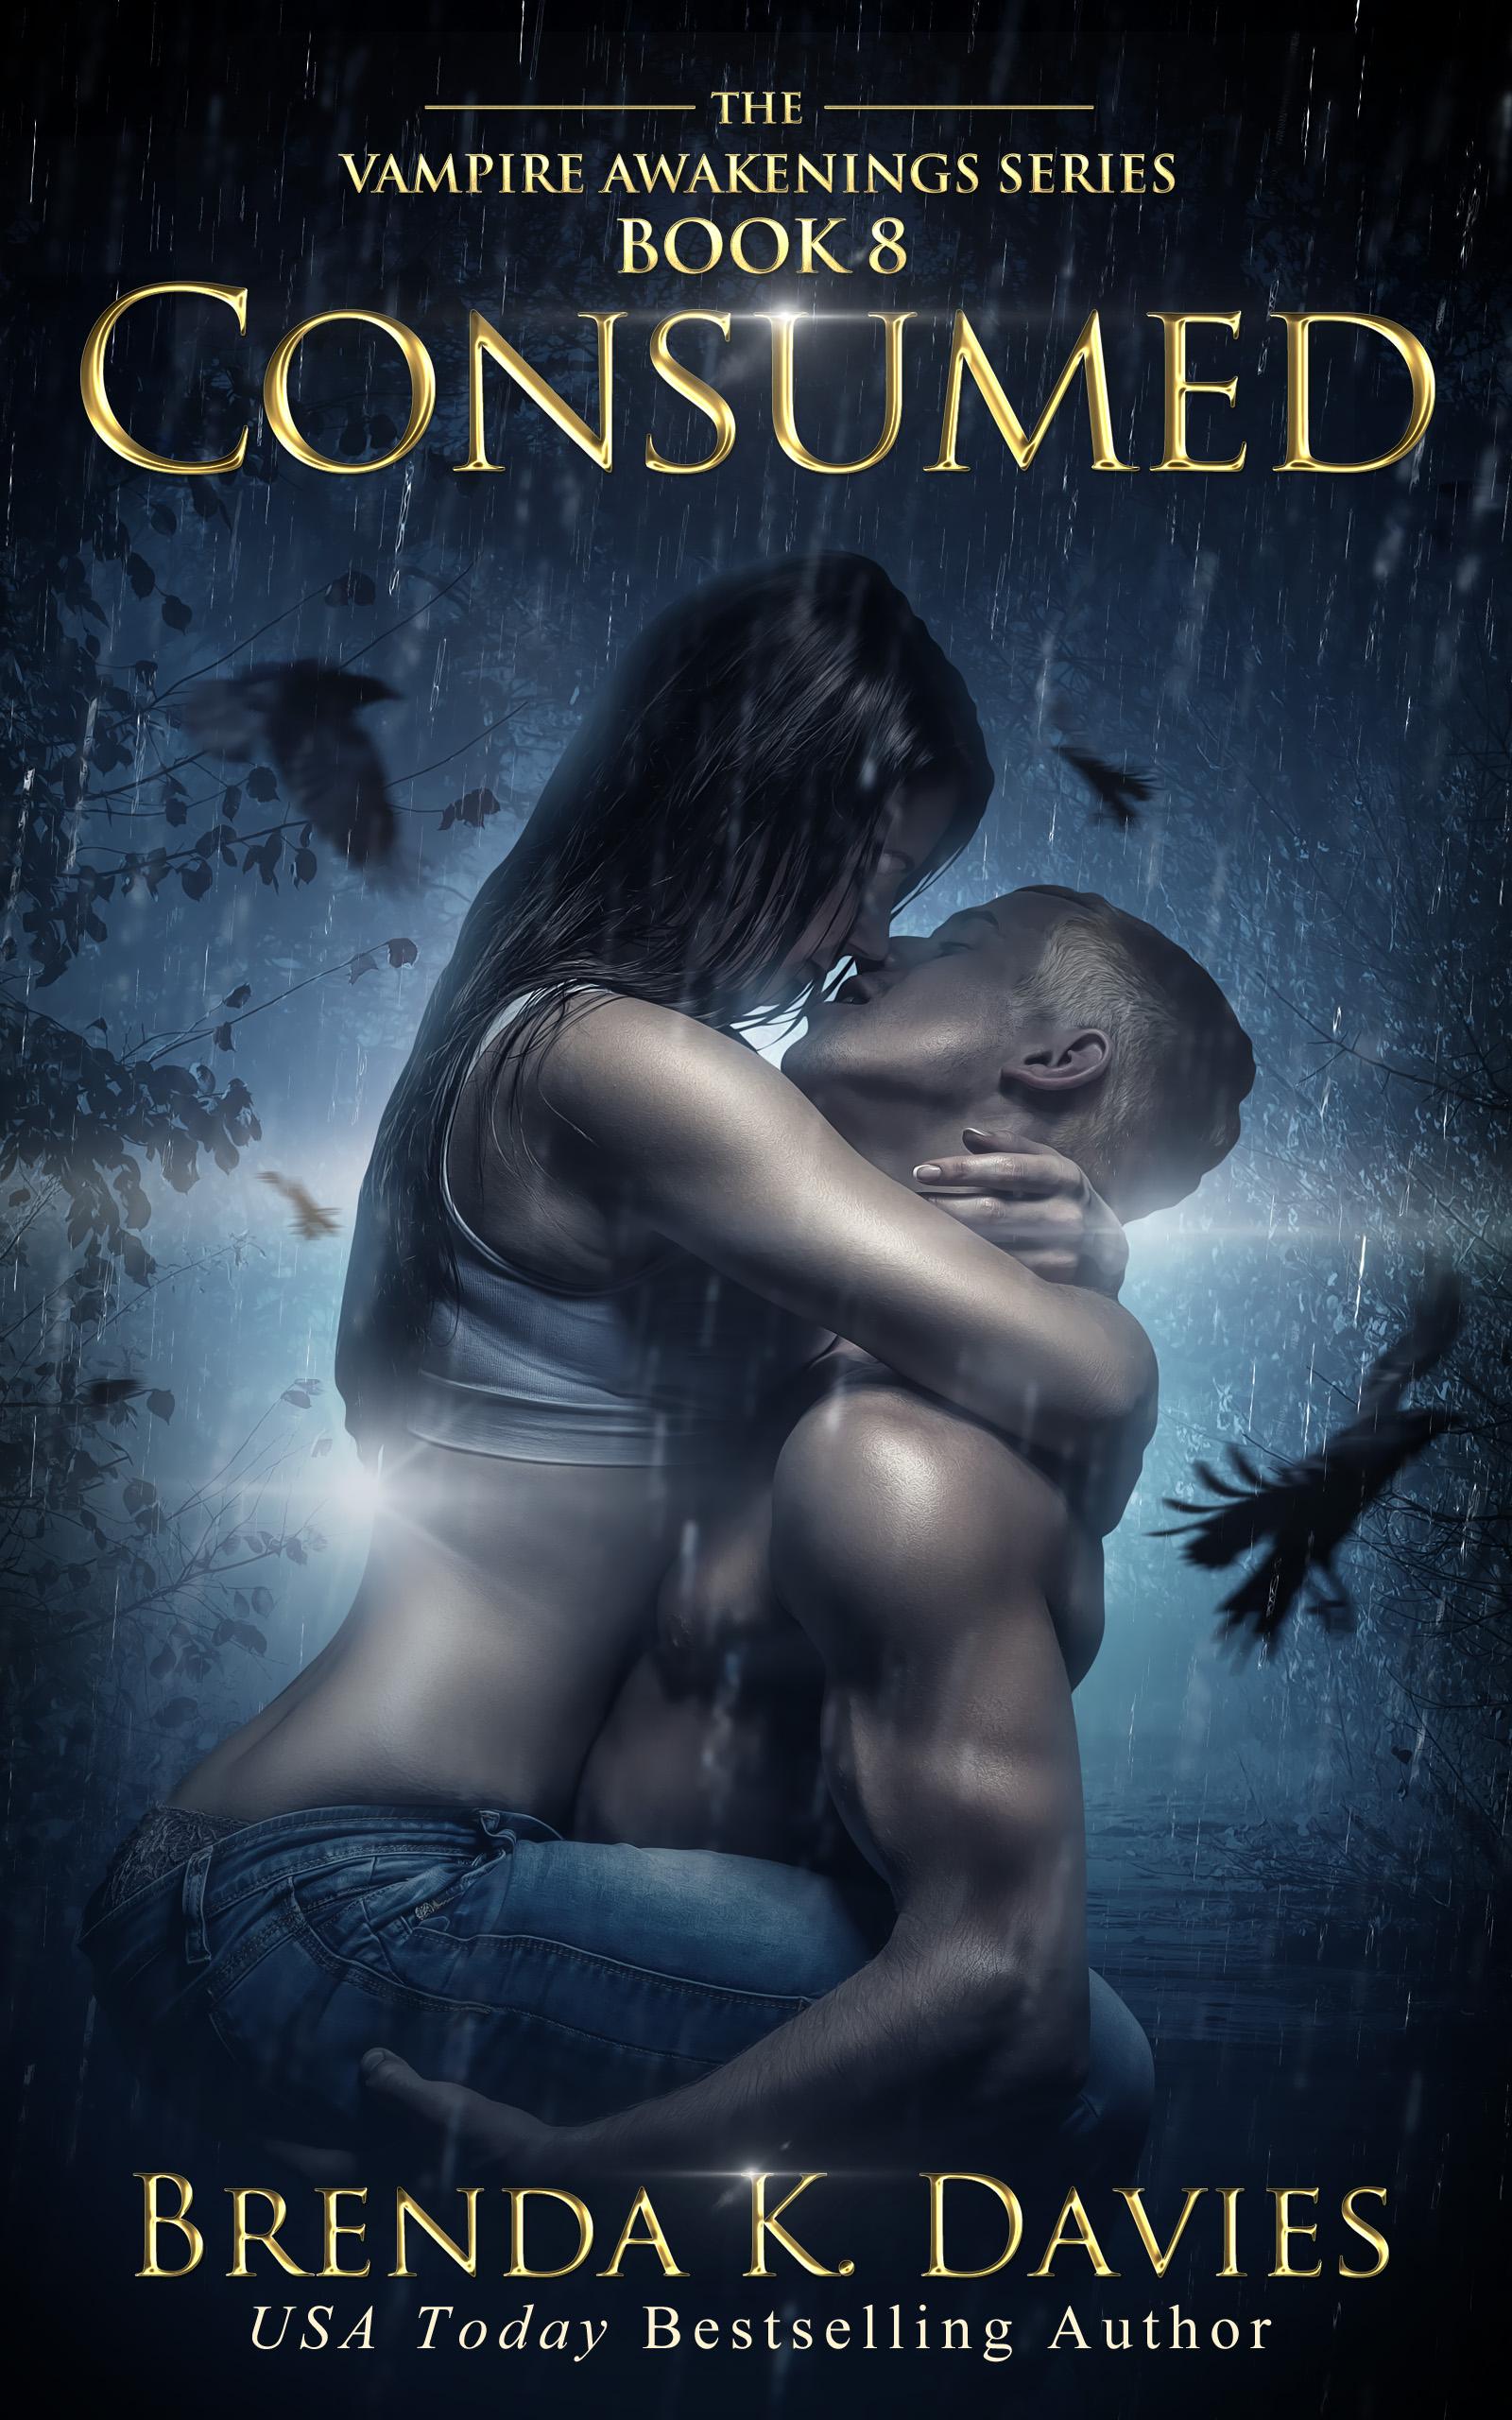 Smashwords Consumed Vampire Awakenings Book 8 A Book By Brenda K Davies